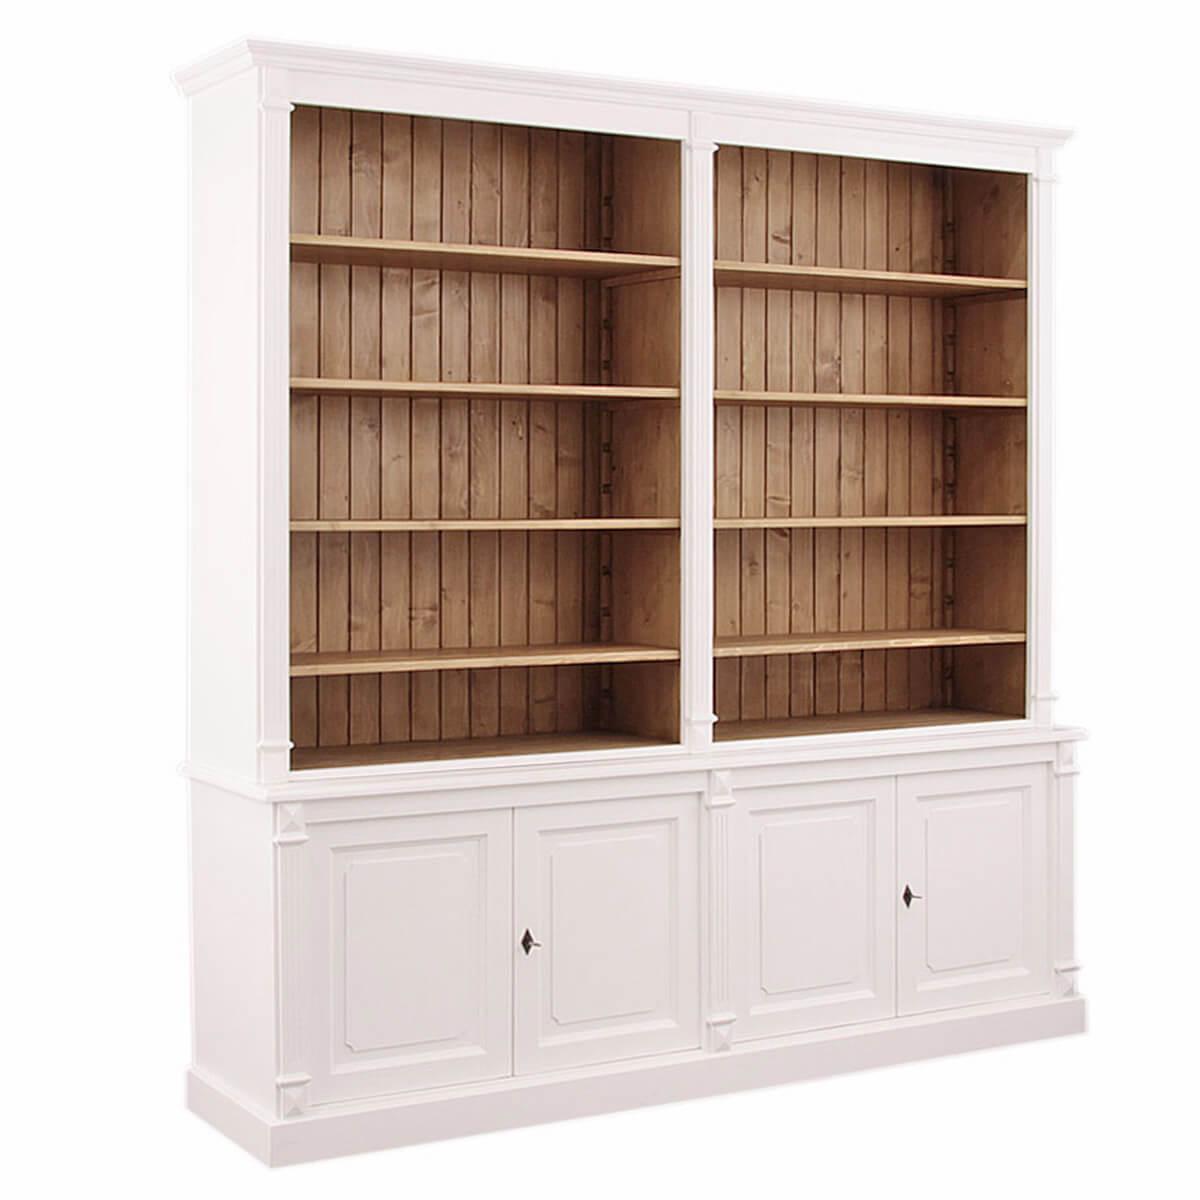 Montague-Open-Book-Shelf-CozyHome-Dubai